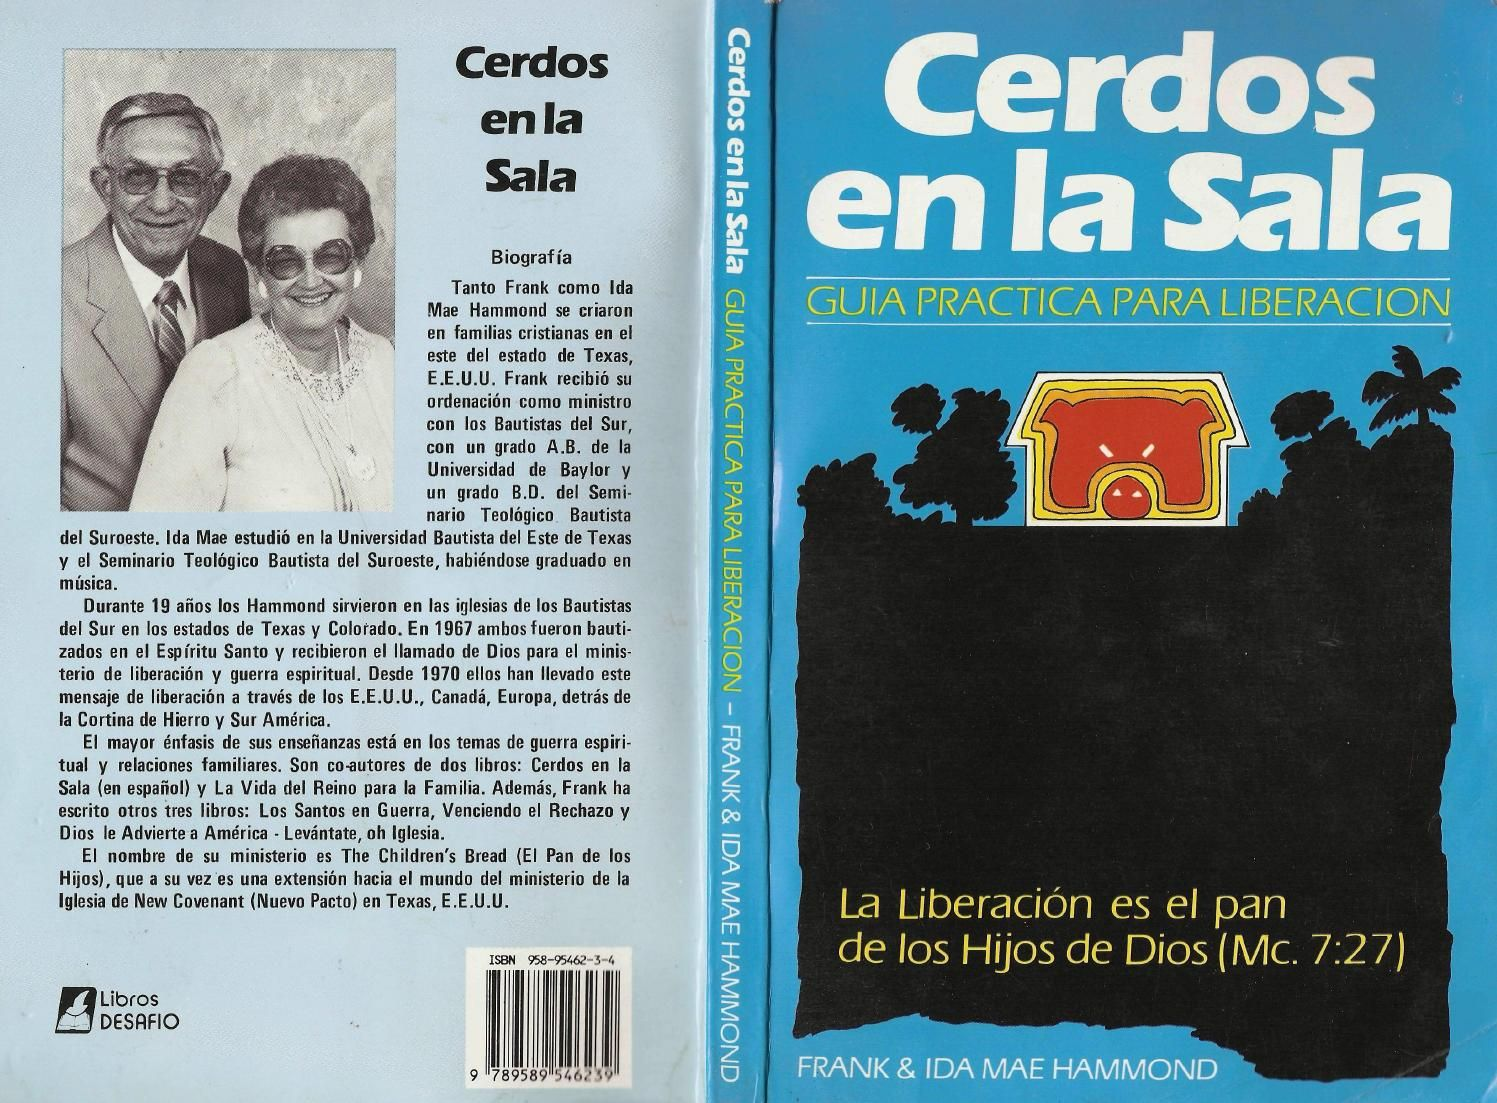 Cerdos en la sala free books film music books__cat__